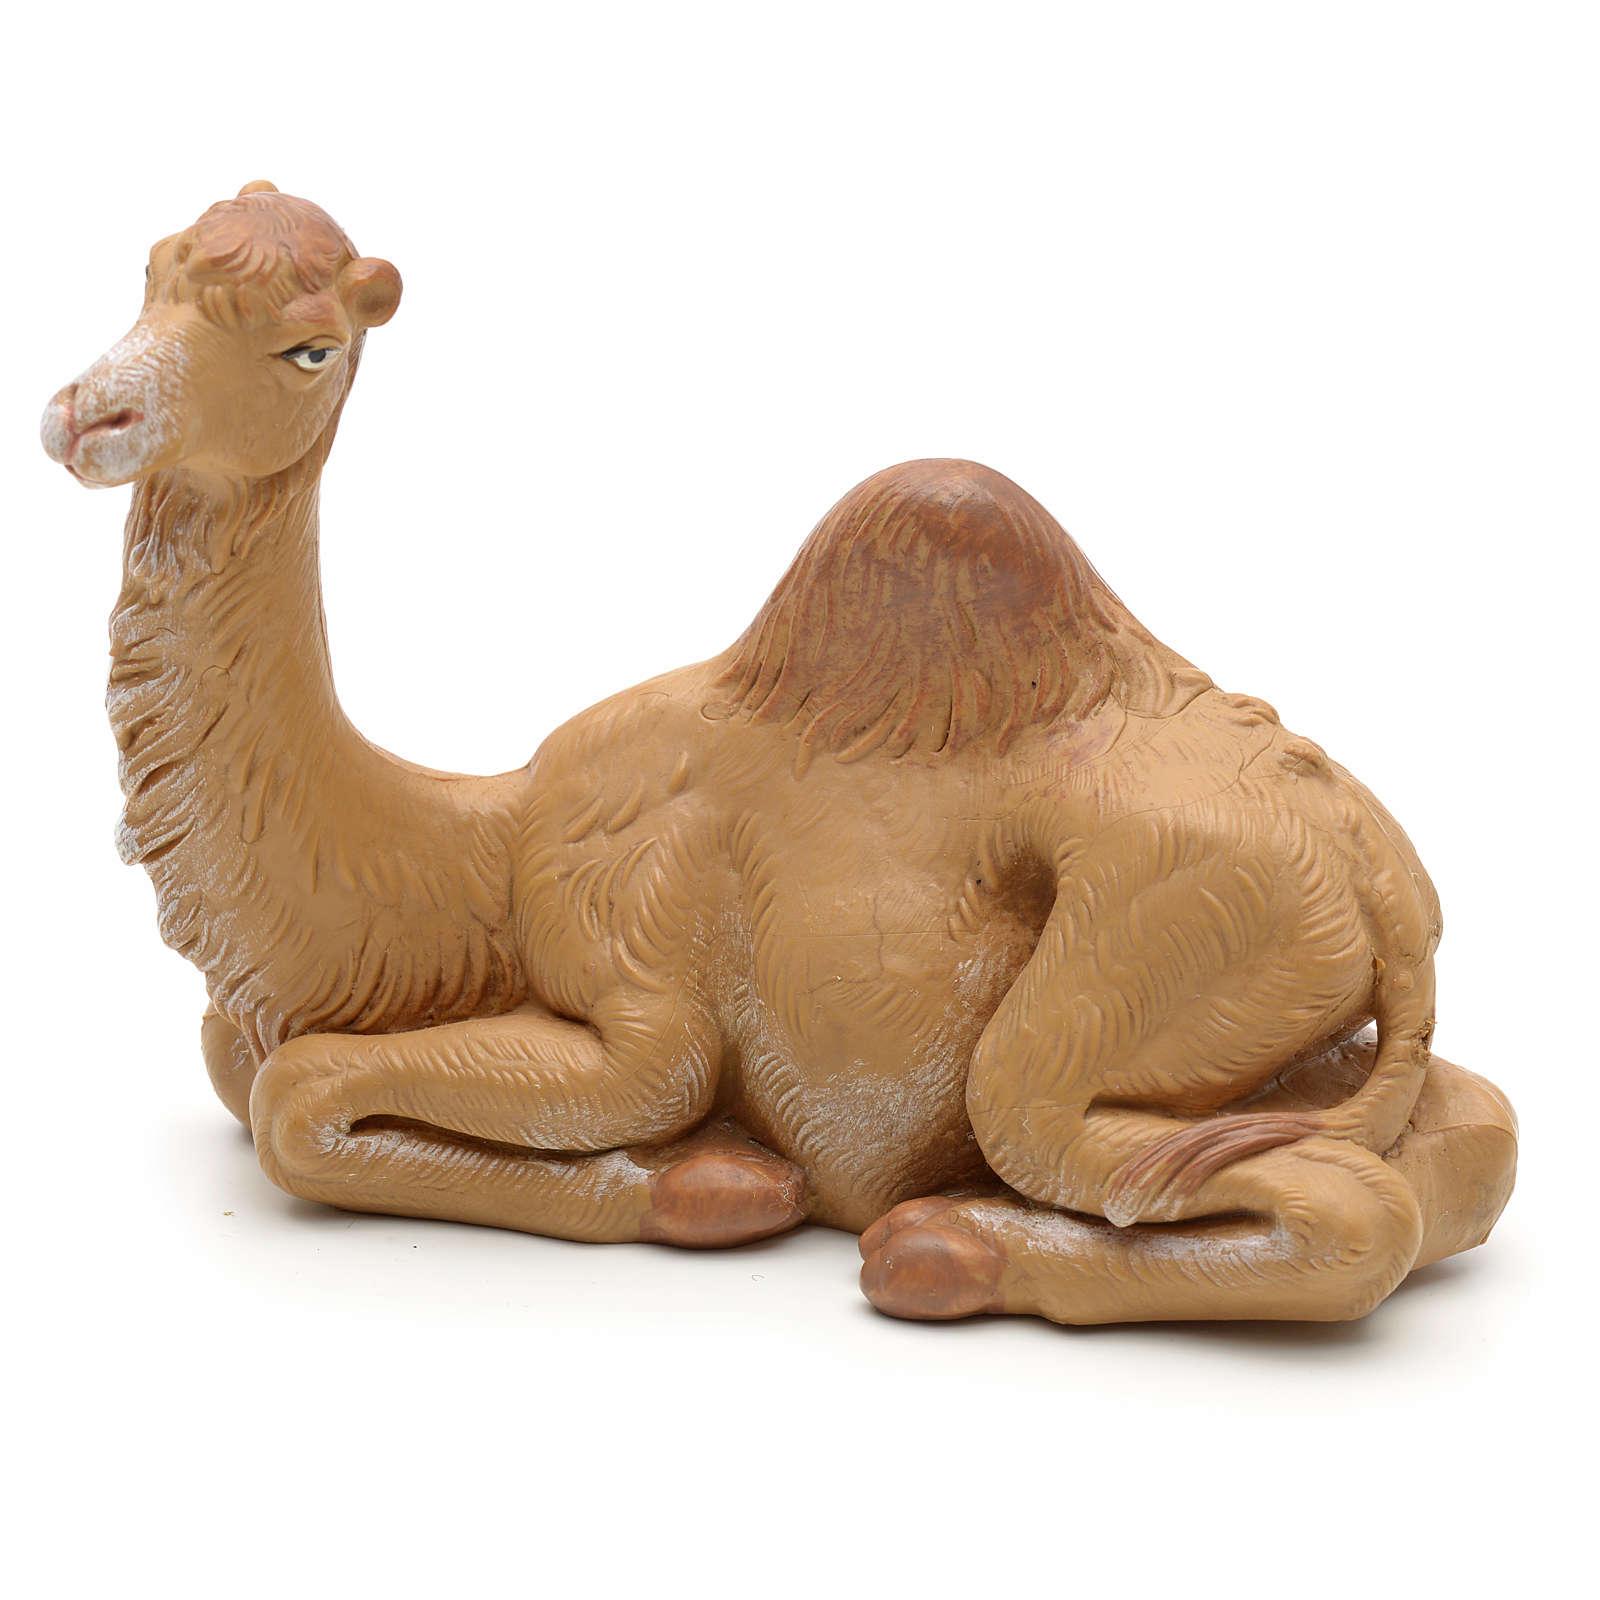 Camello sentado 12 cm Fontanini pvc 3